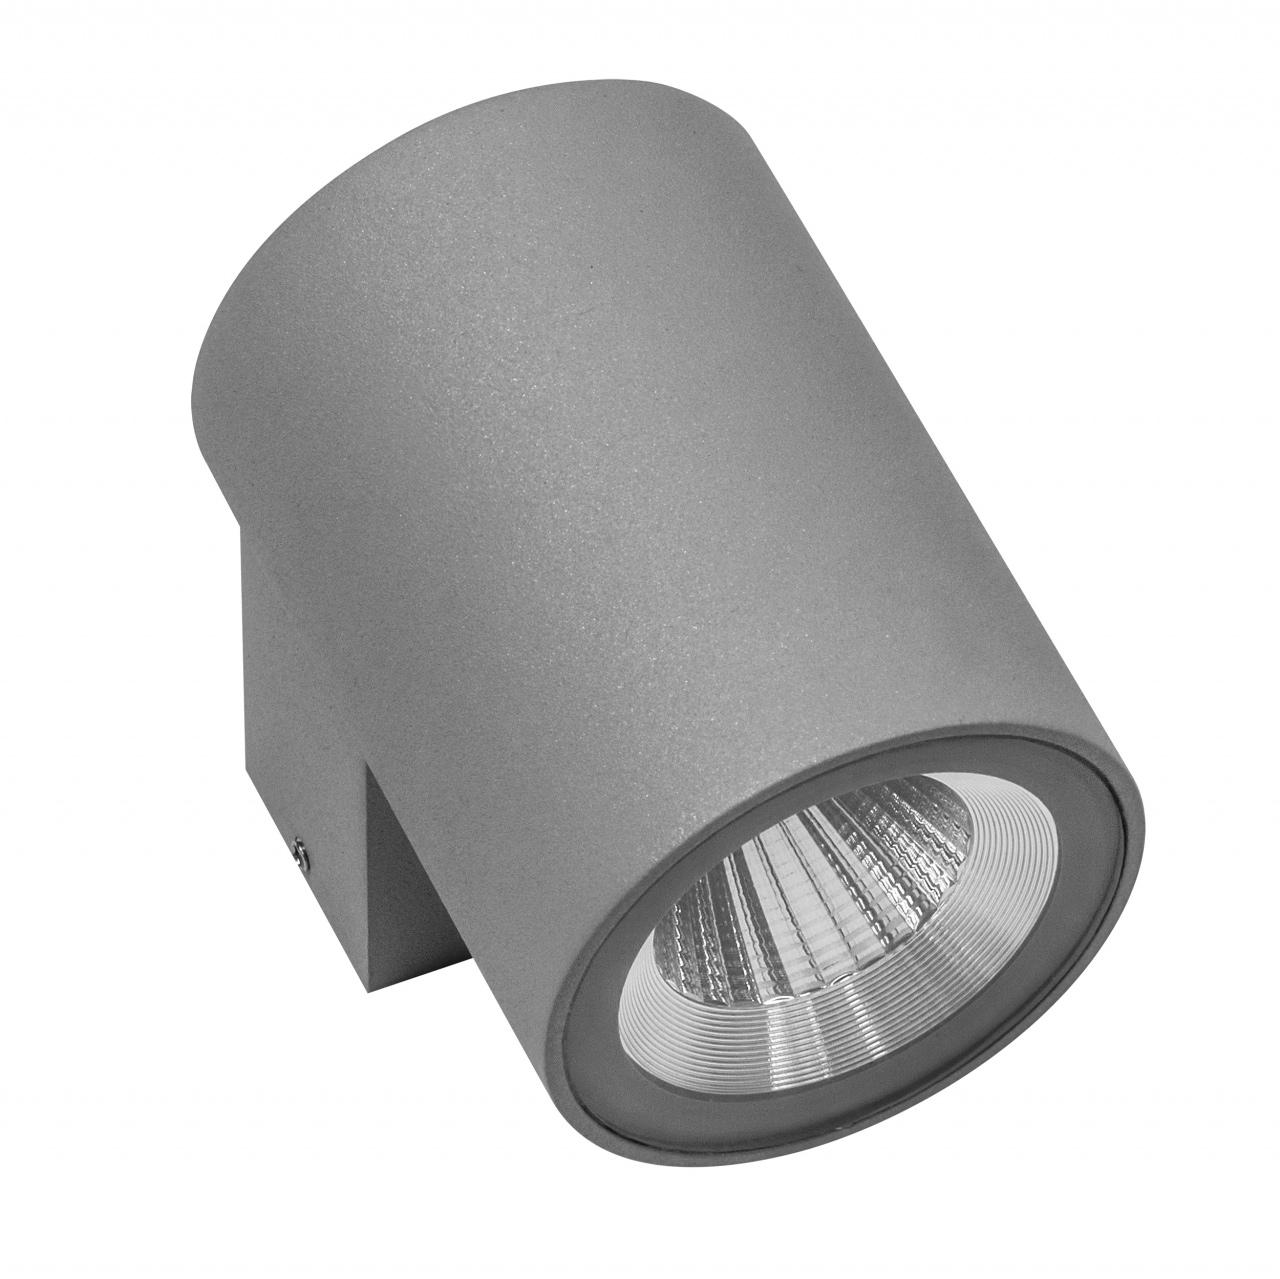 Светильник Paro LED 8W 600LM 24G серый 4000K IP65 Lightstar 350694